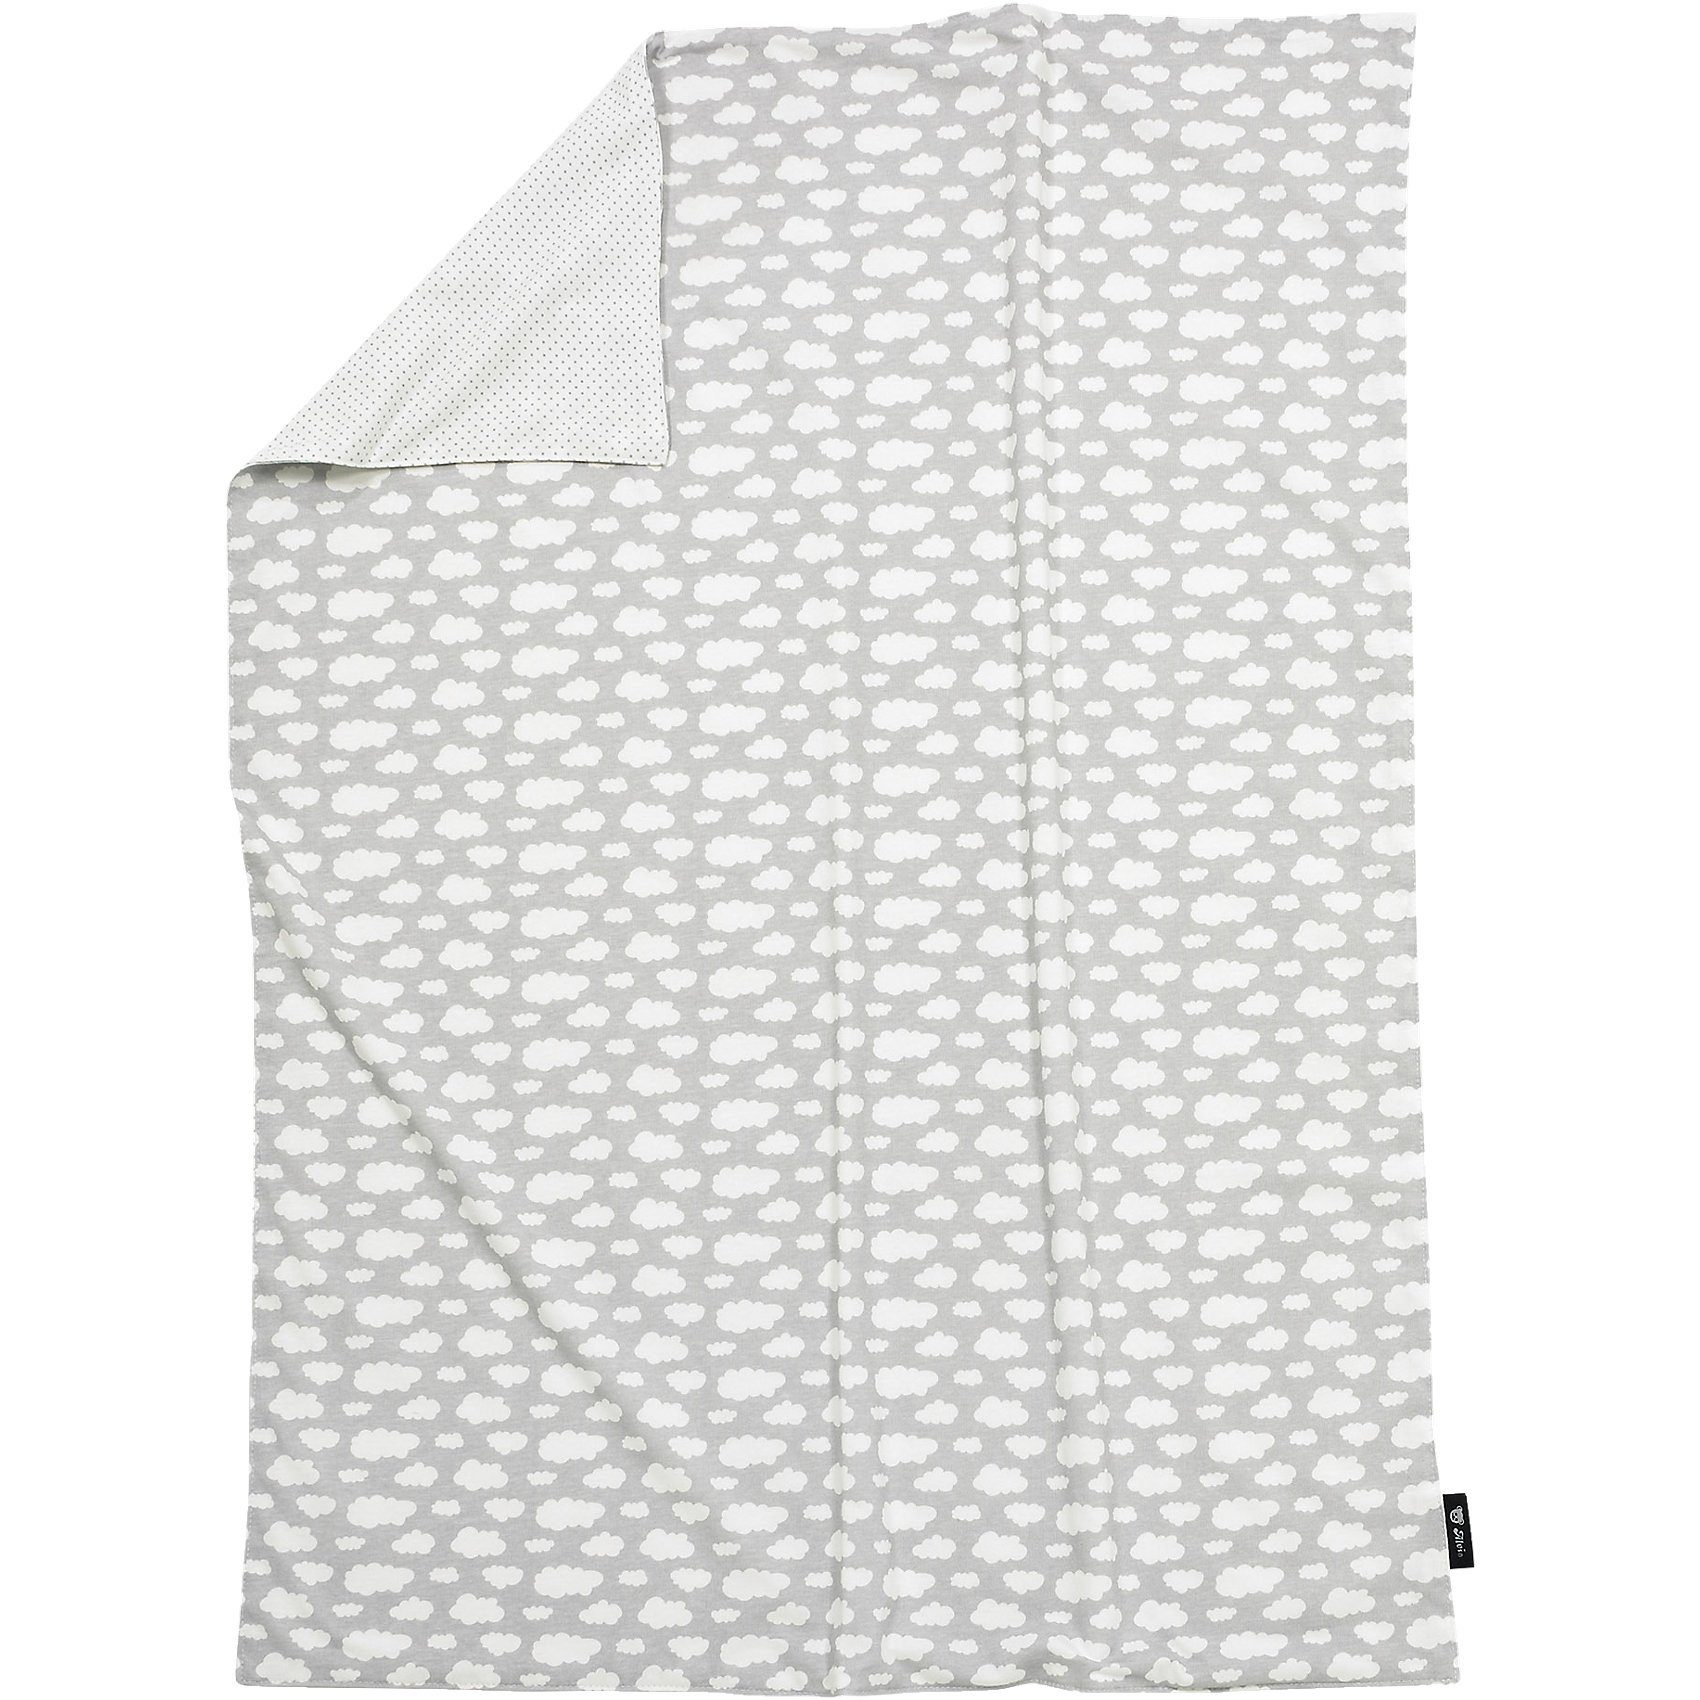 Alvi Babydecke, Jersey, Wolke, silber, 75 x 100 cm